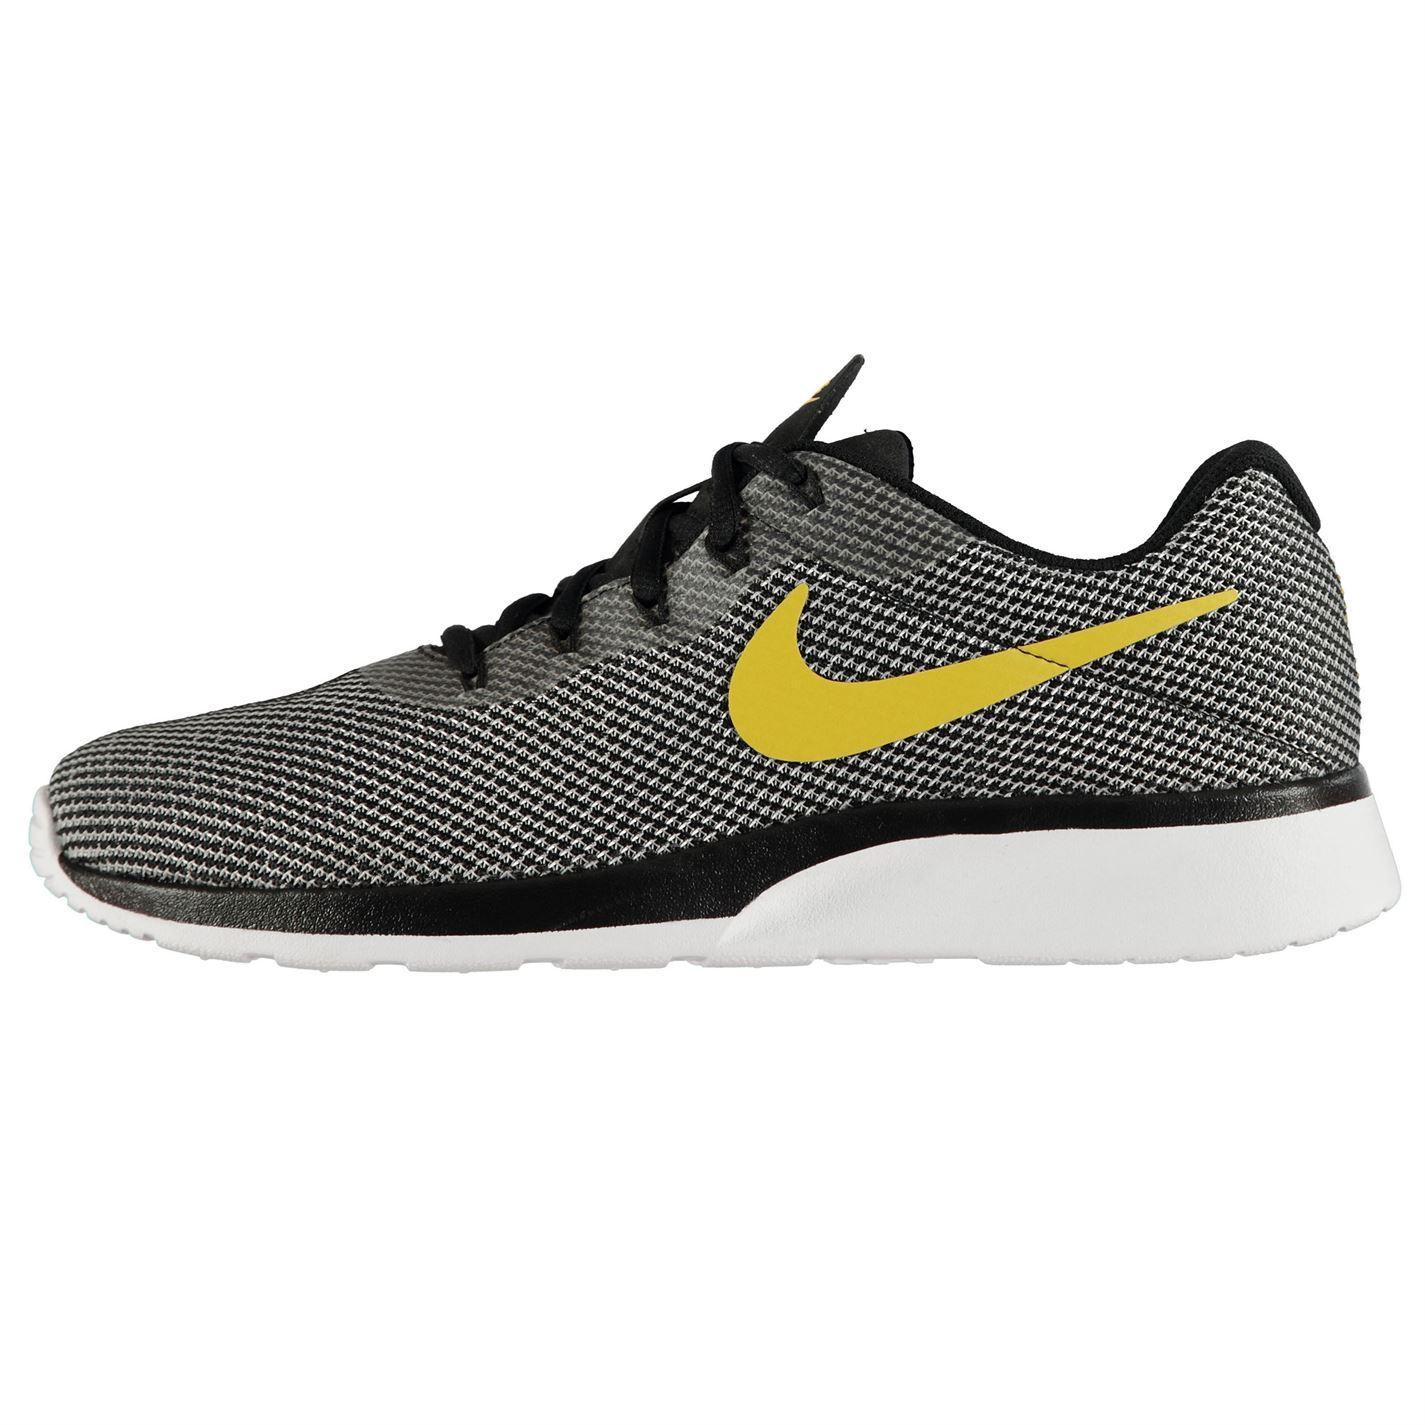 Dettagli su Nike Tanjun Racer Scarpe da Corsa Uomo Fitness Jogging Sportive Ginnastica